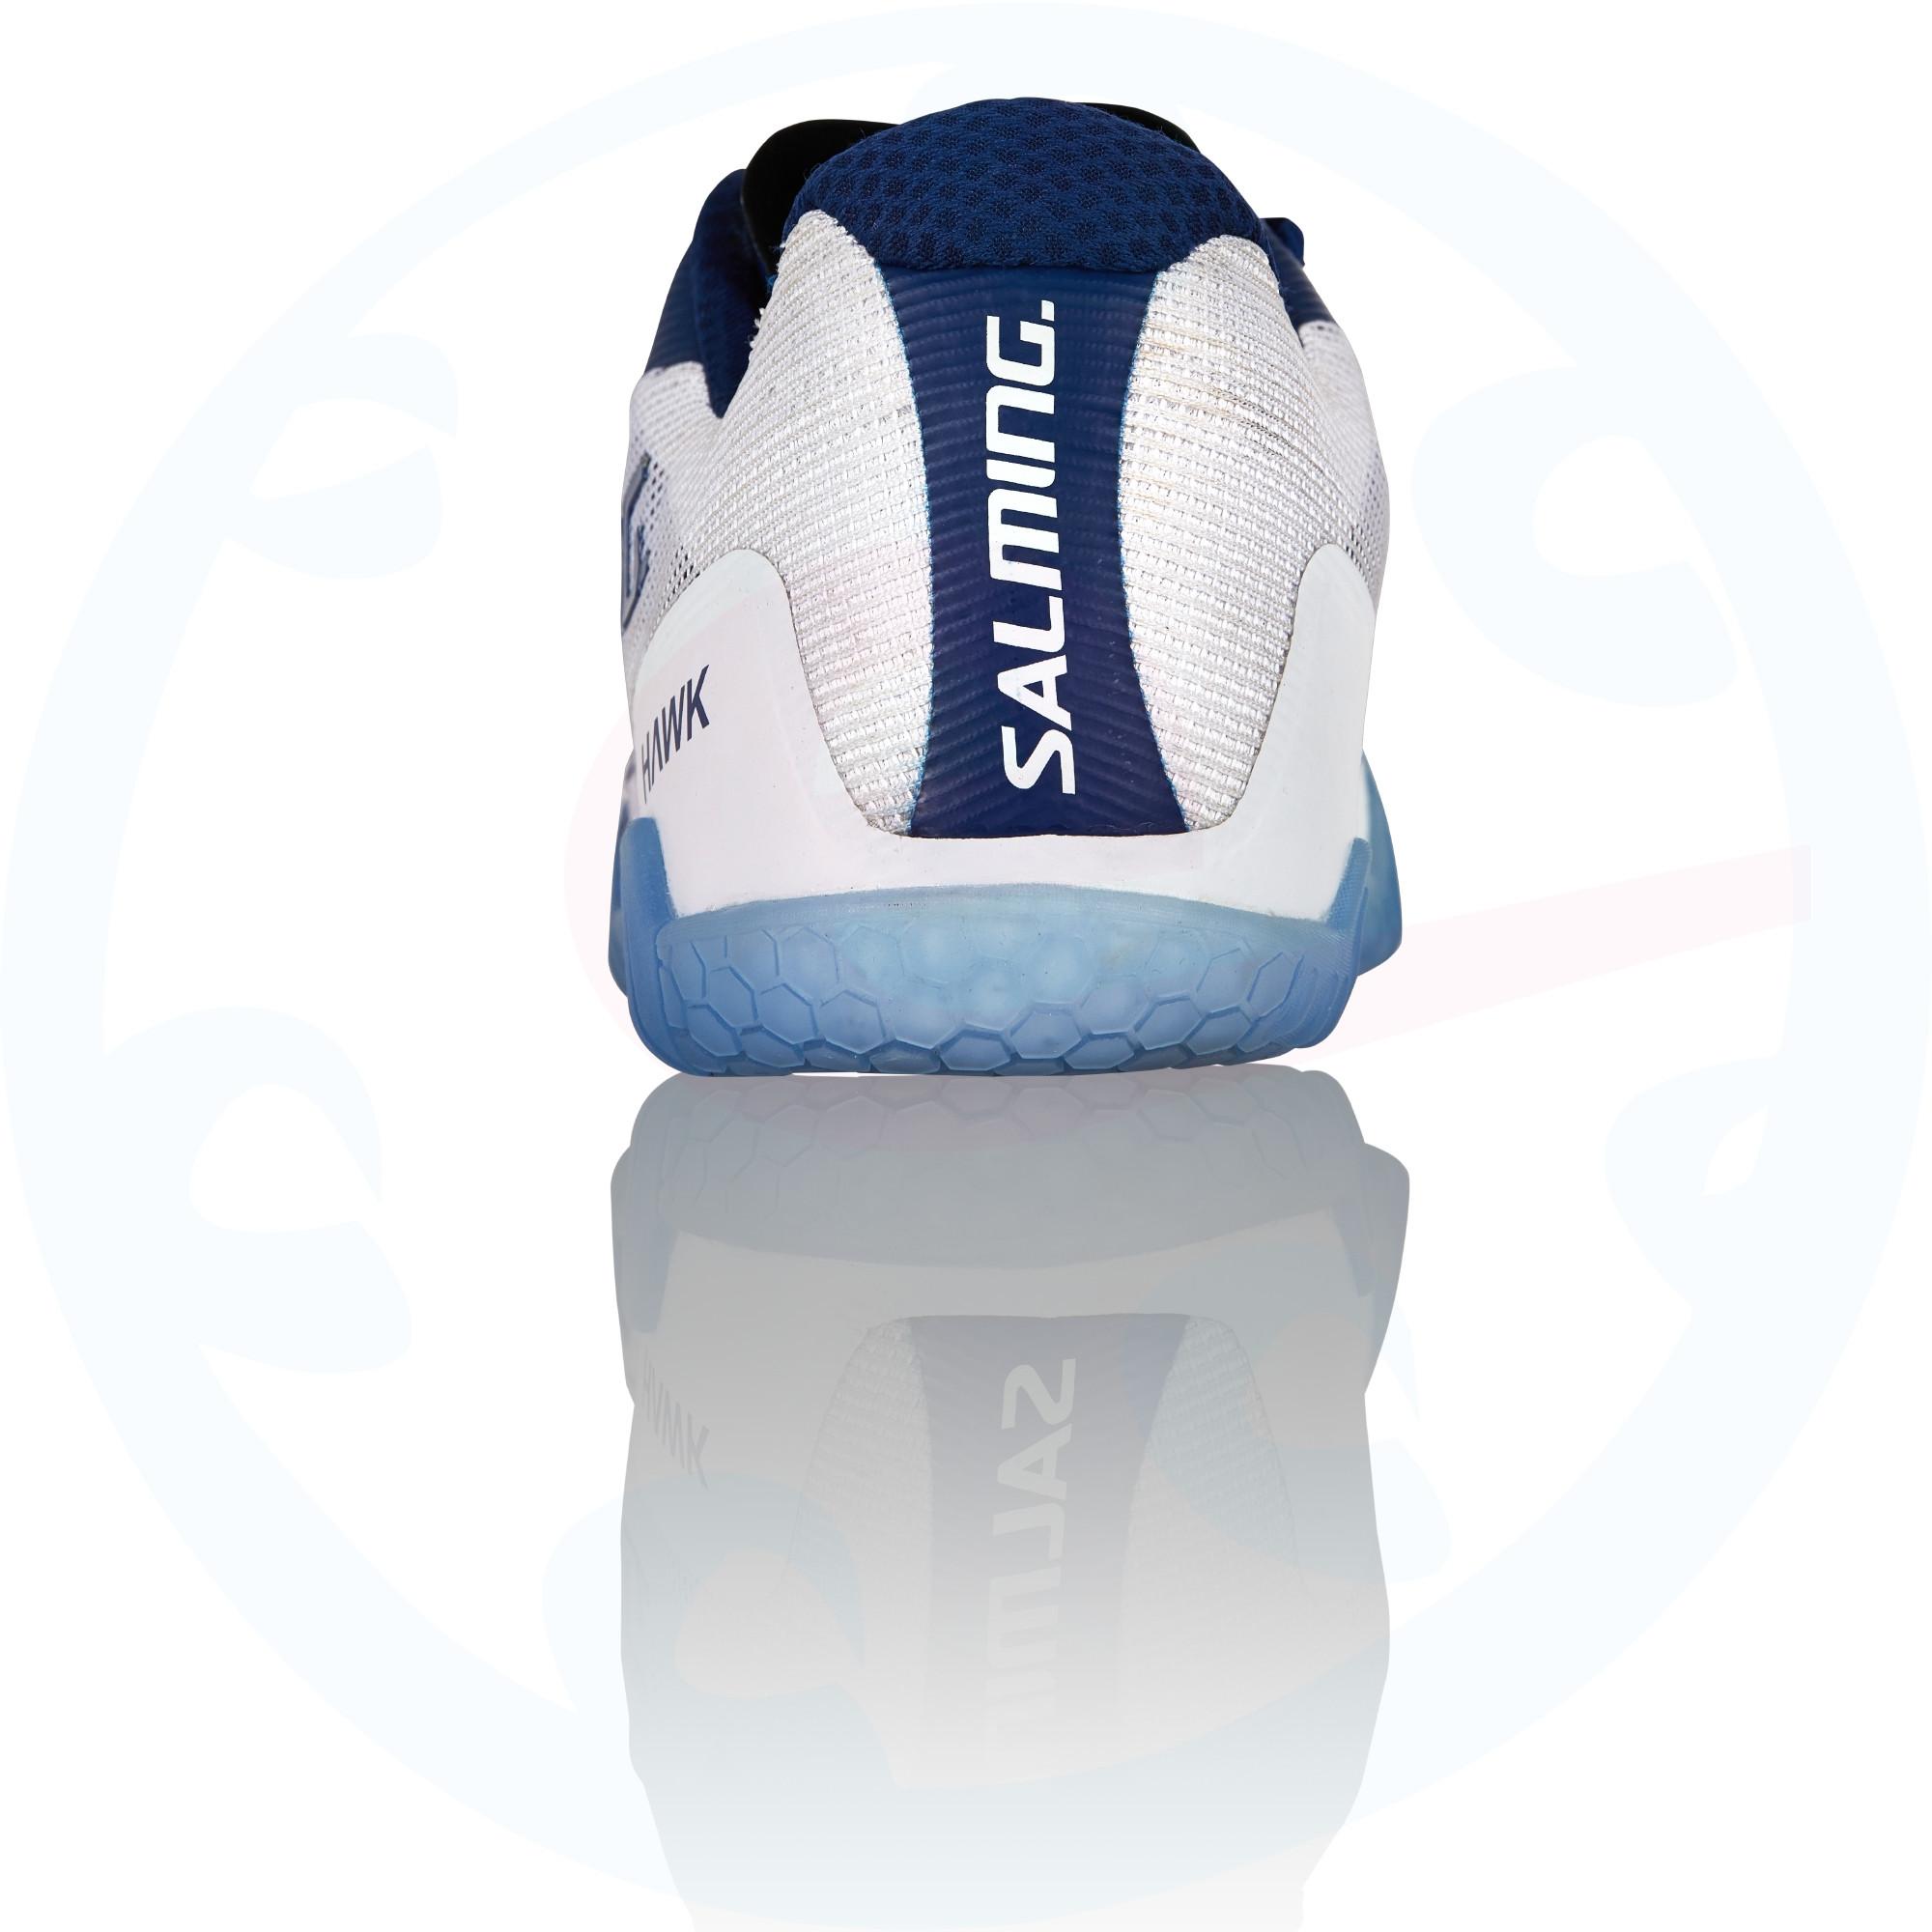 Whitenavy Blue Hawk Women Shoes Indoor Salming Shoe CBWdorxe